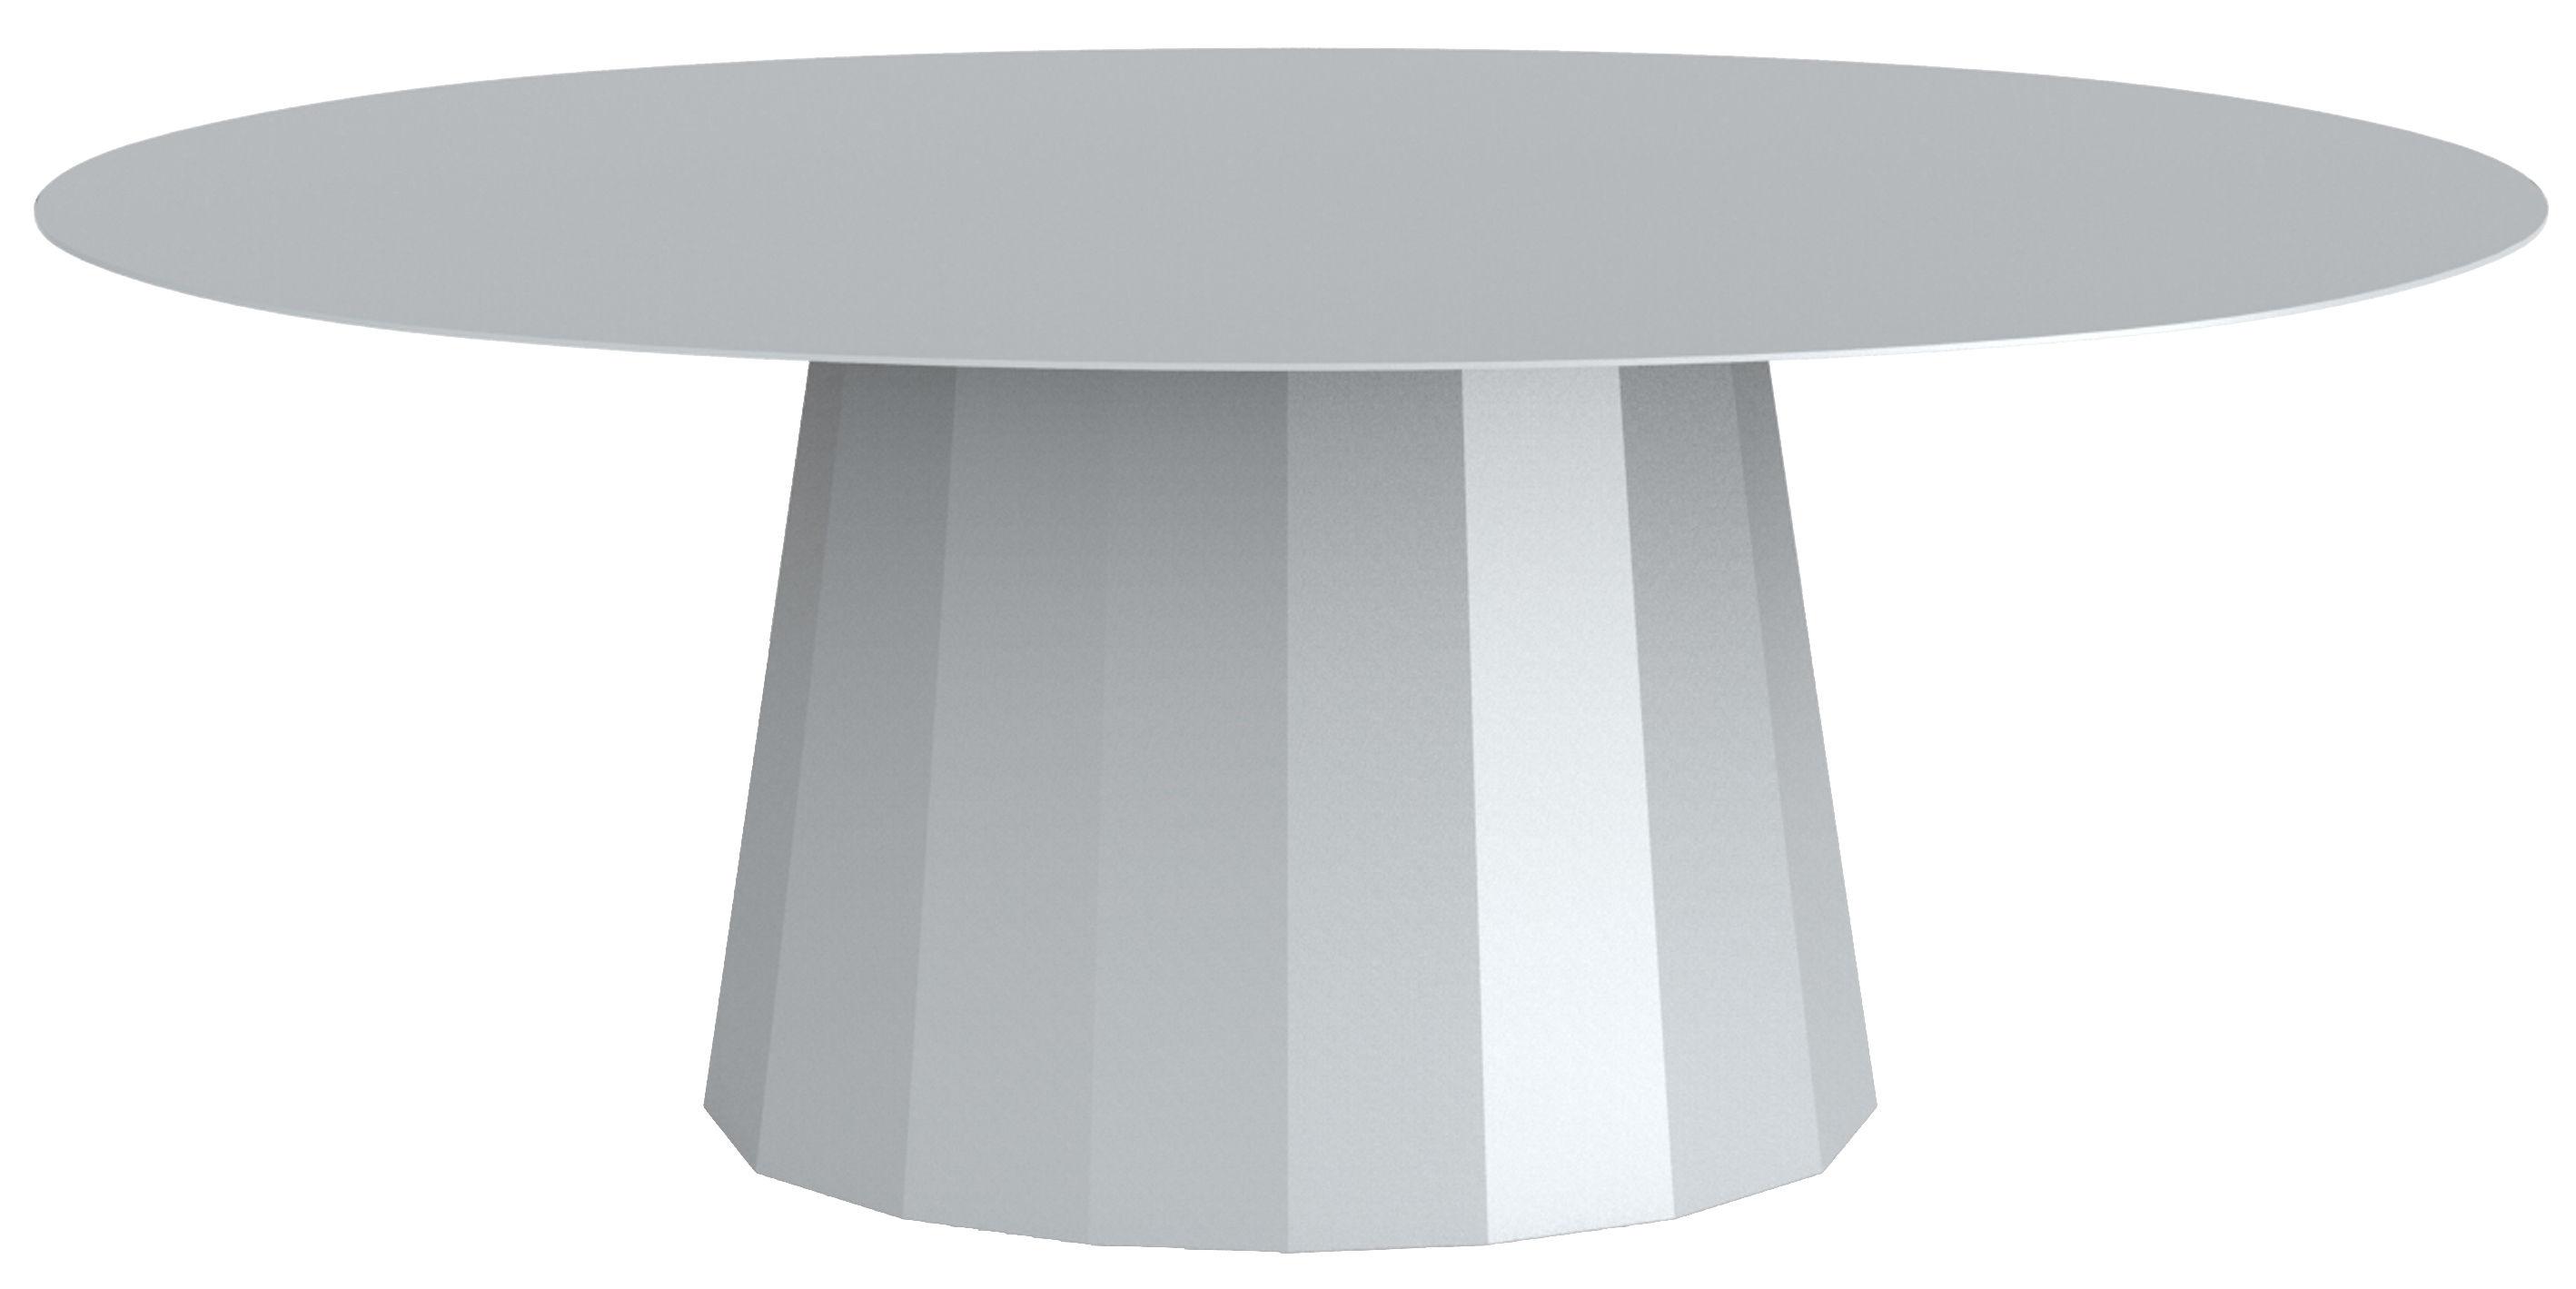 Arredamento - Tavolini  - Tavolino basso Ankara / L 109 x H 42 cm - Matière Grise - Grigio - Acciaio verniciato